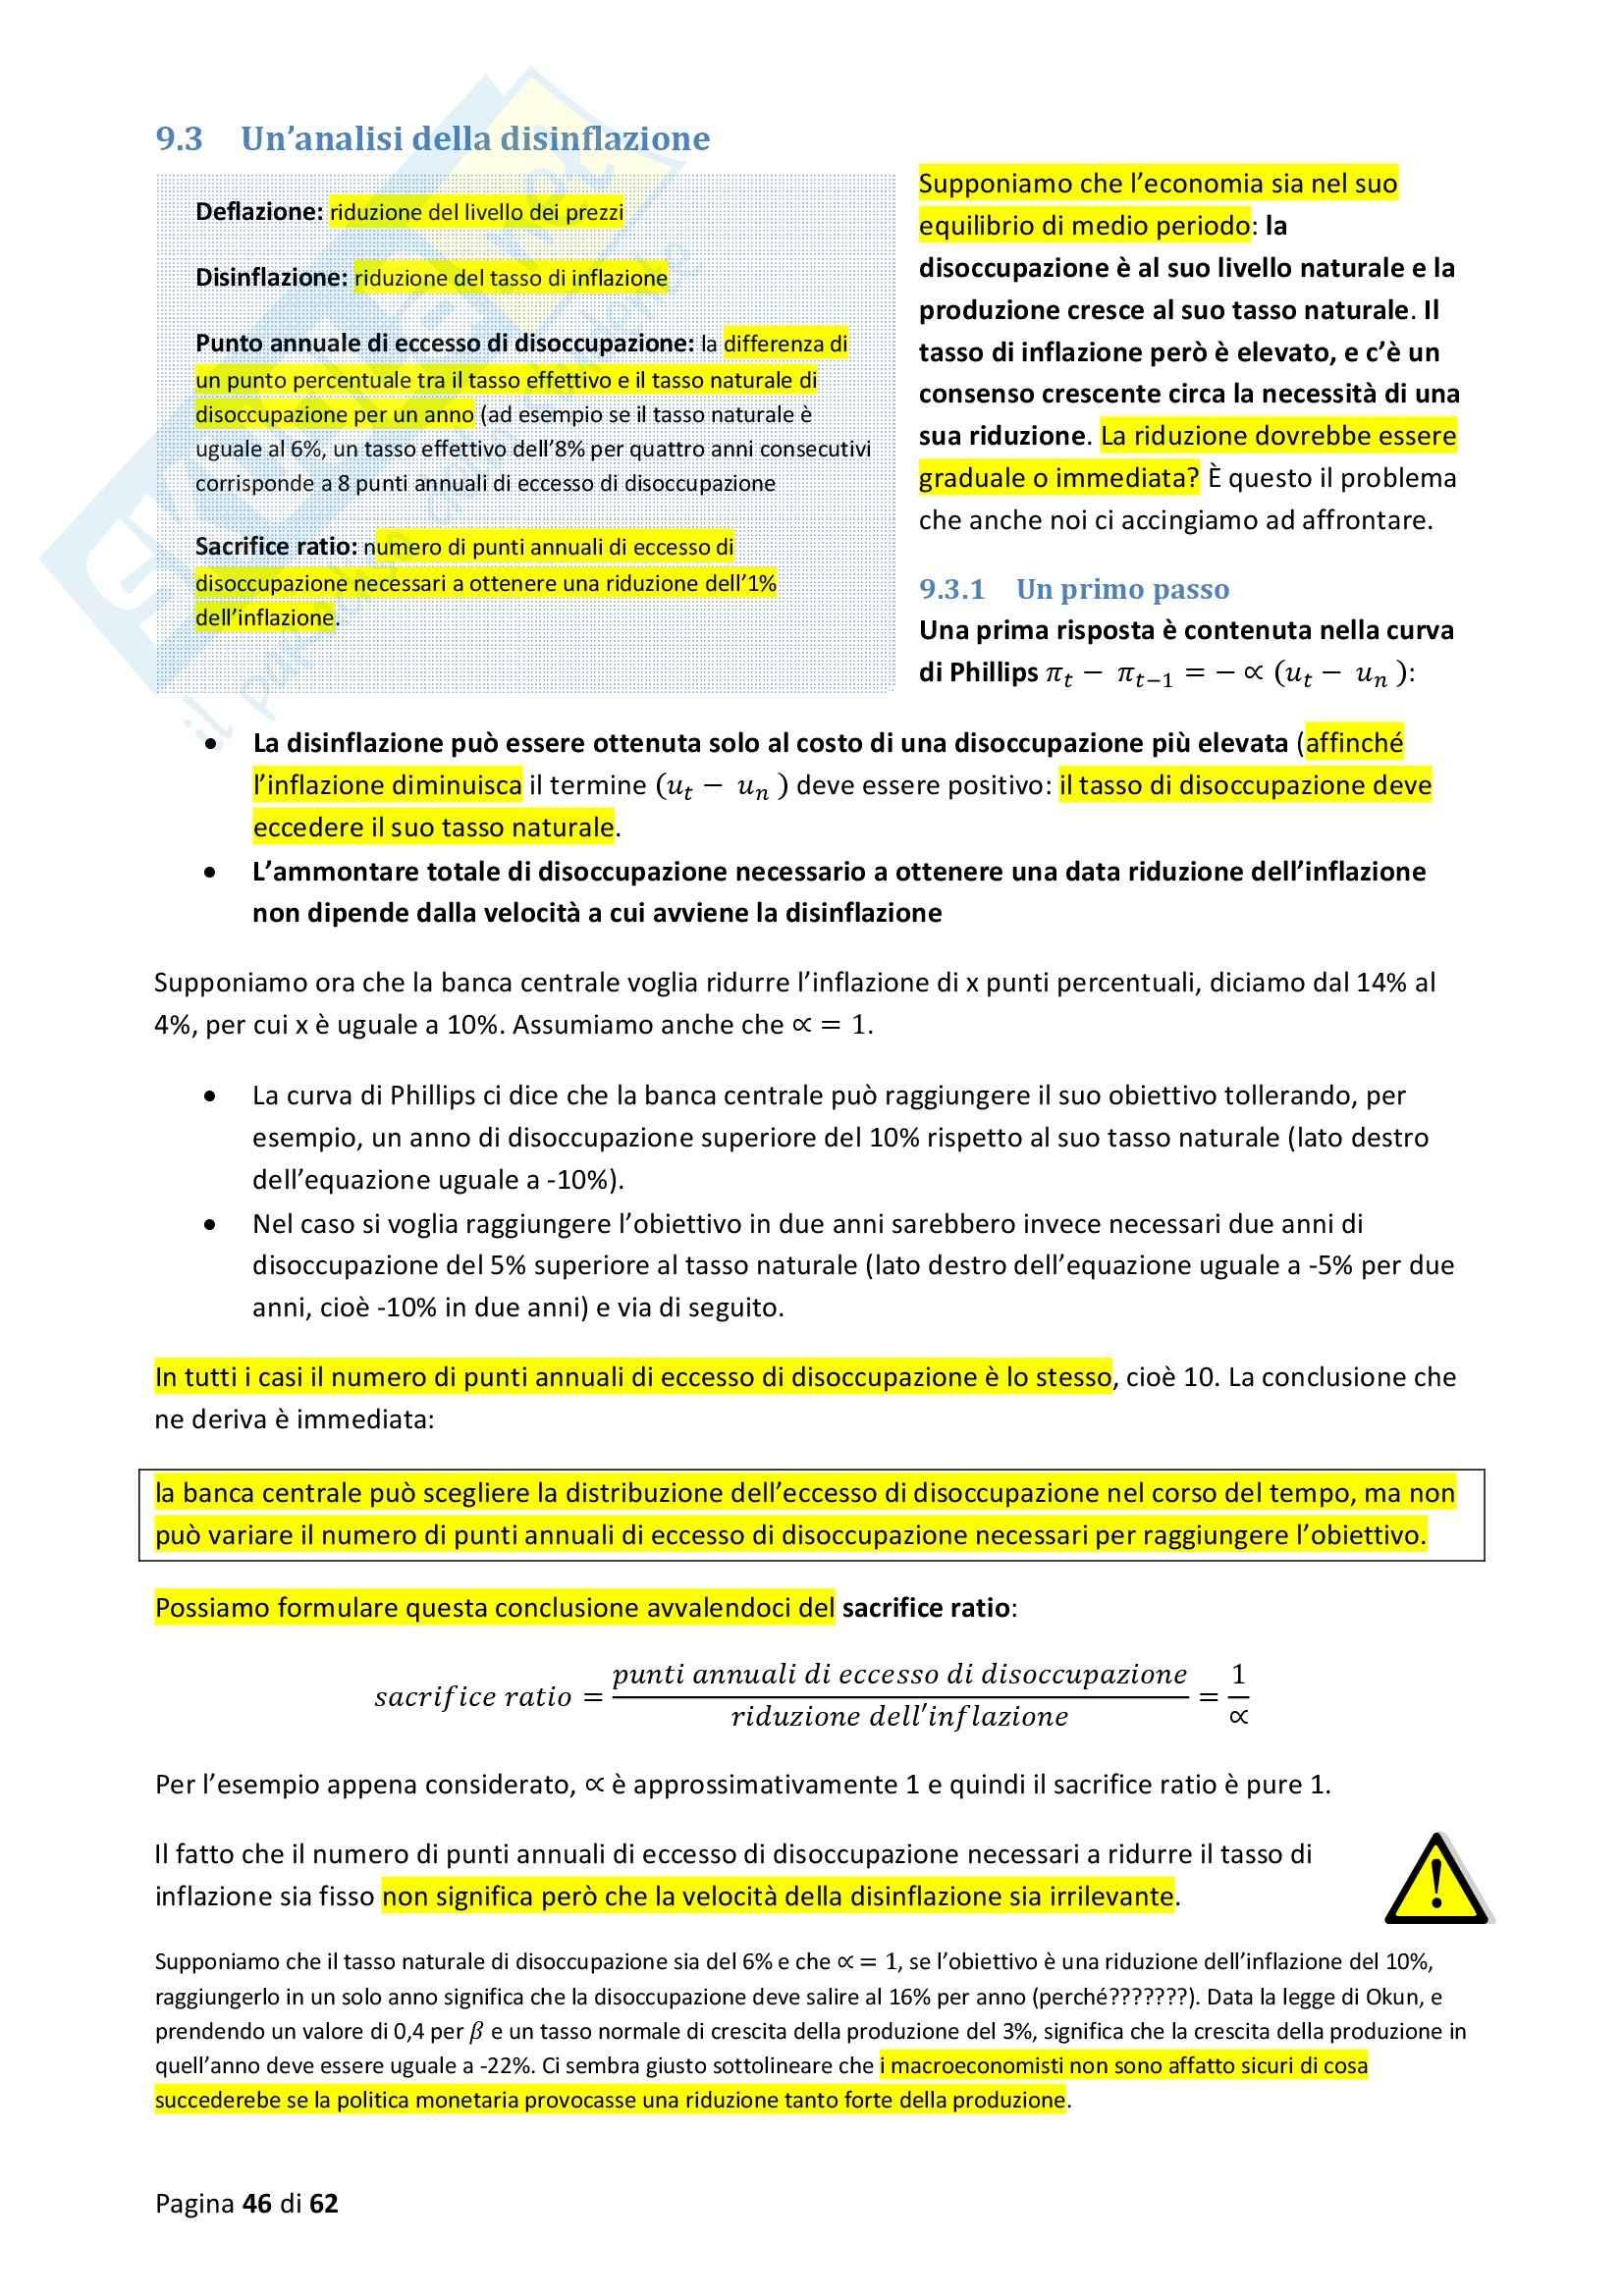 Riassunto esame Macroeconomia, prof. Blanchard, libro consigliato Macroeconomia Pag. 46